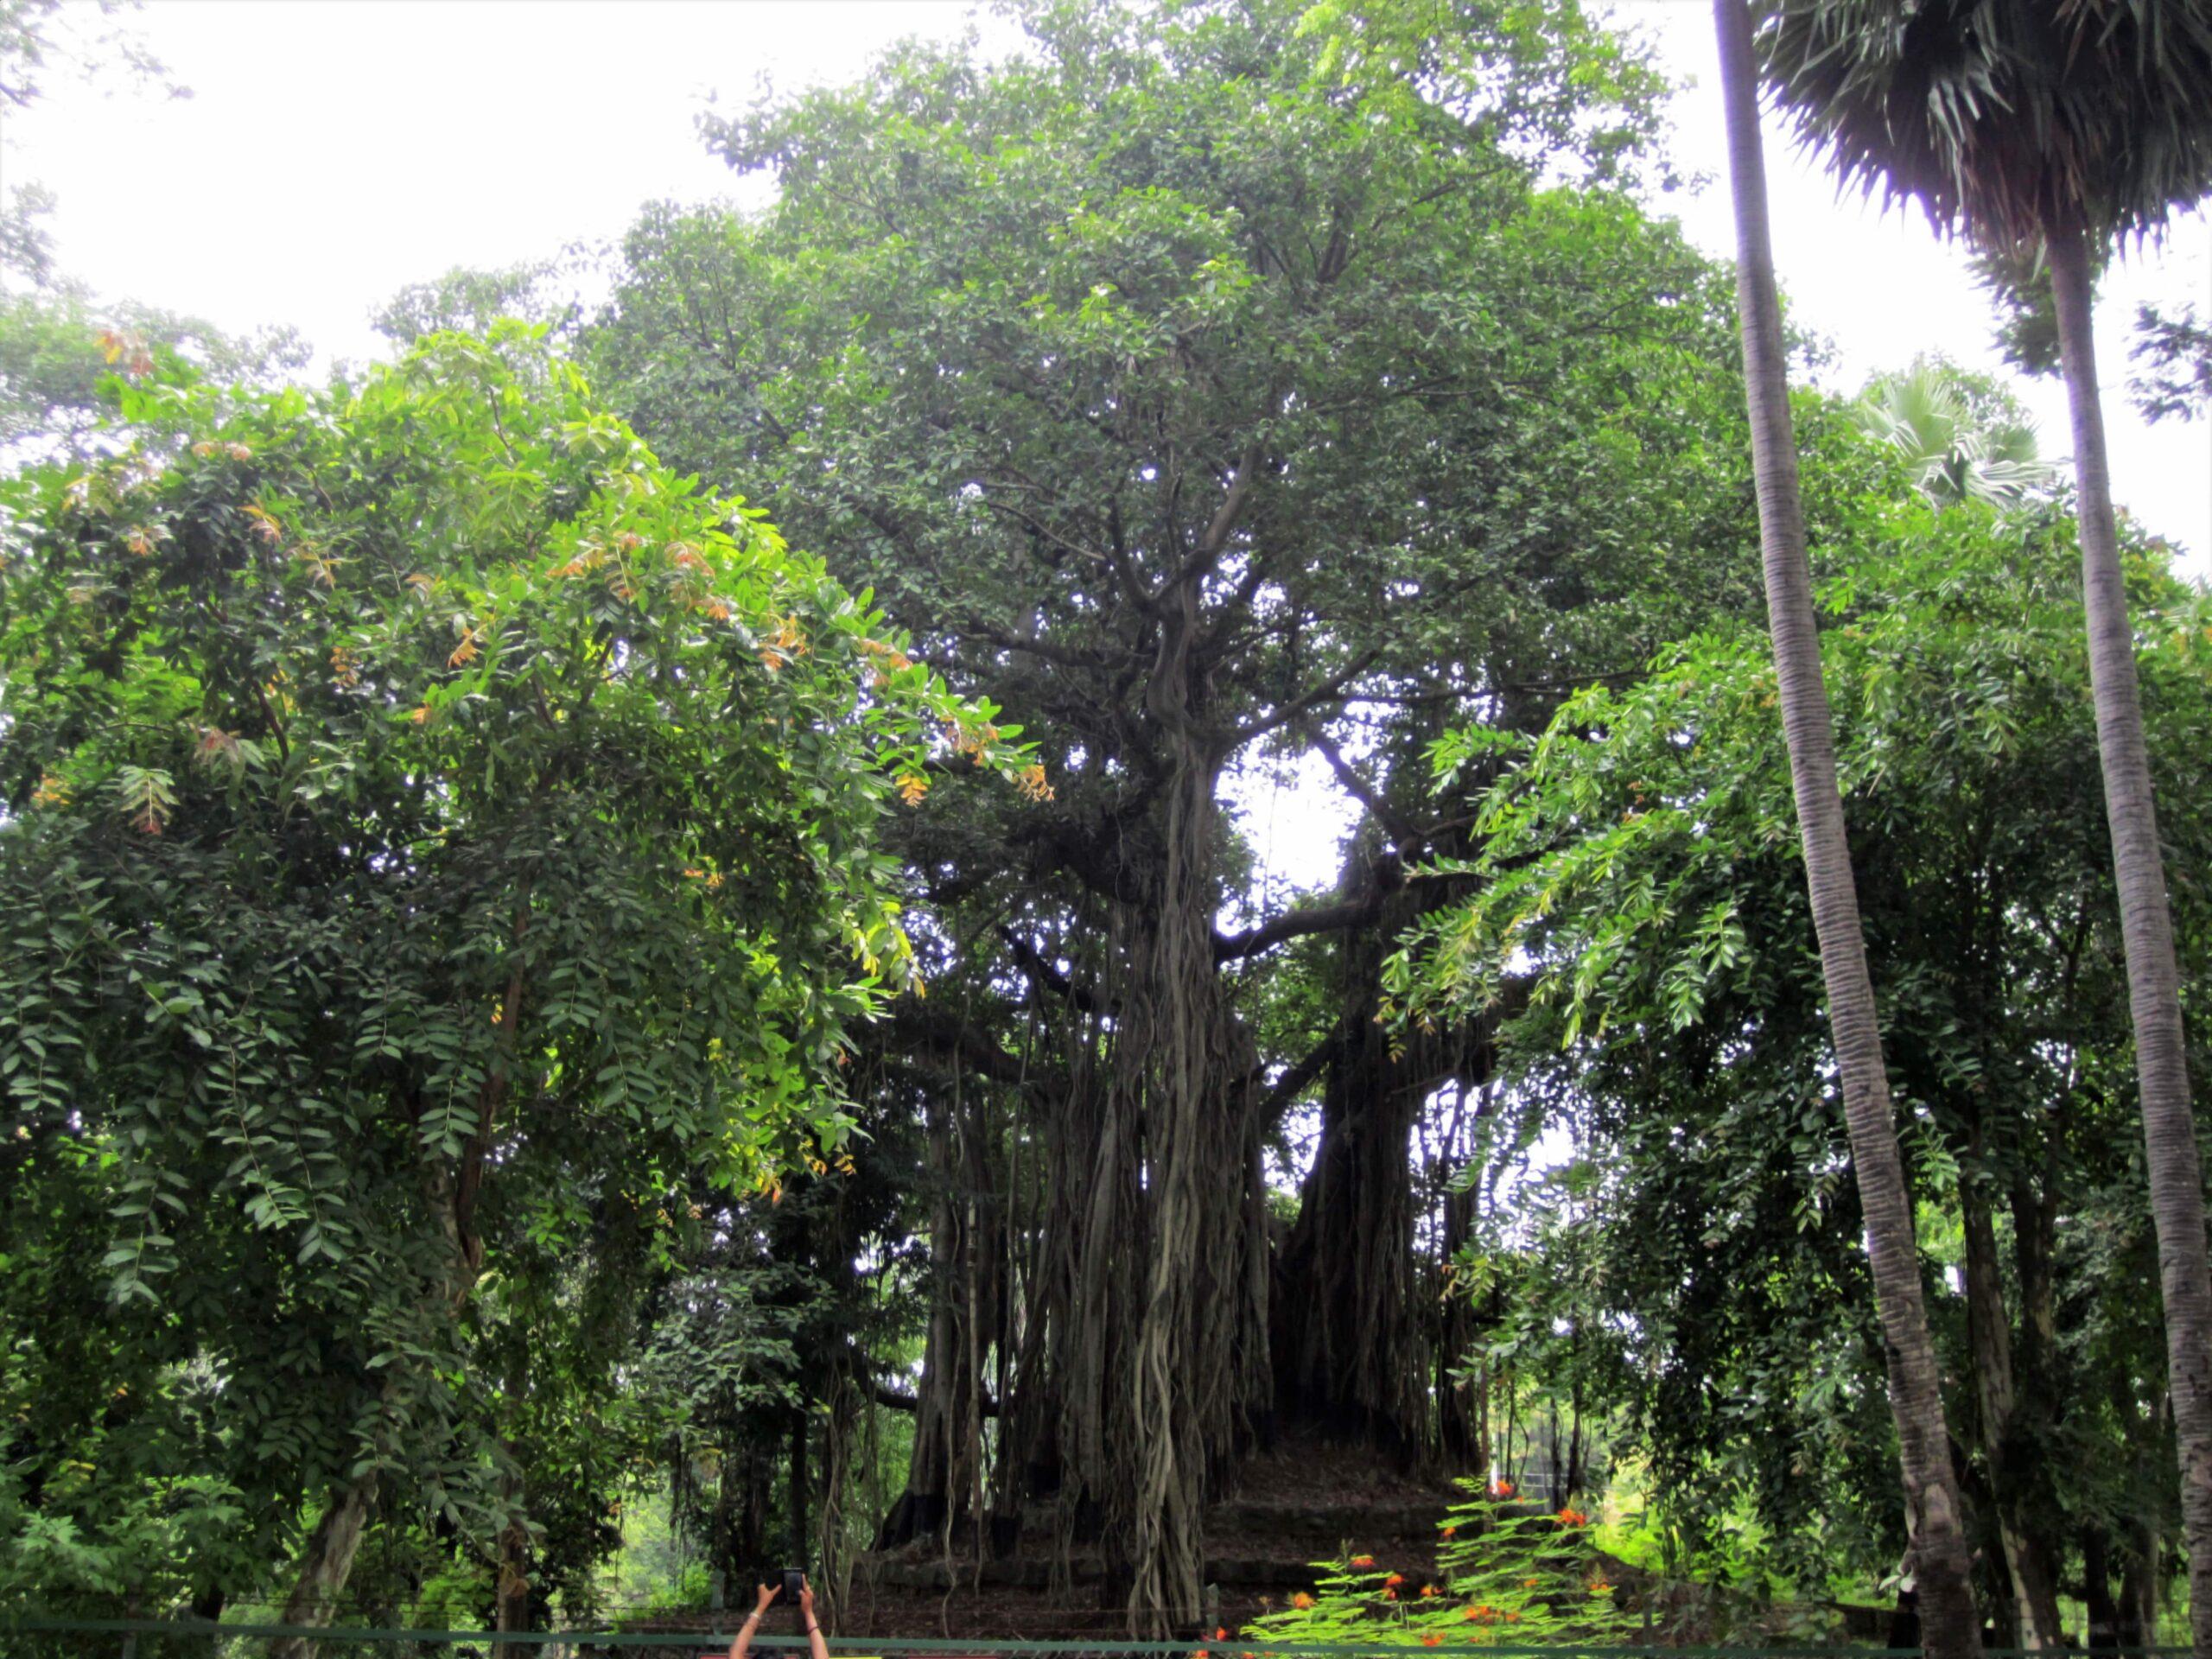 Teenpahar - The Banyan Tree within Vishva Bharati University Complex